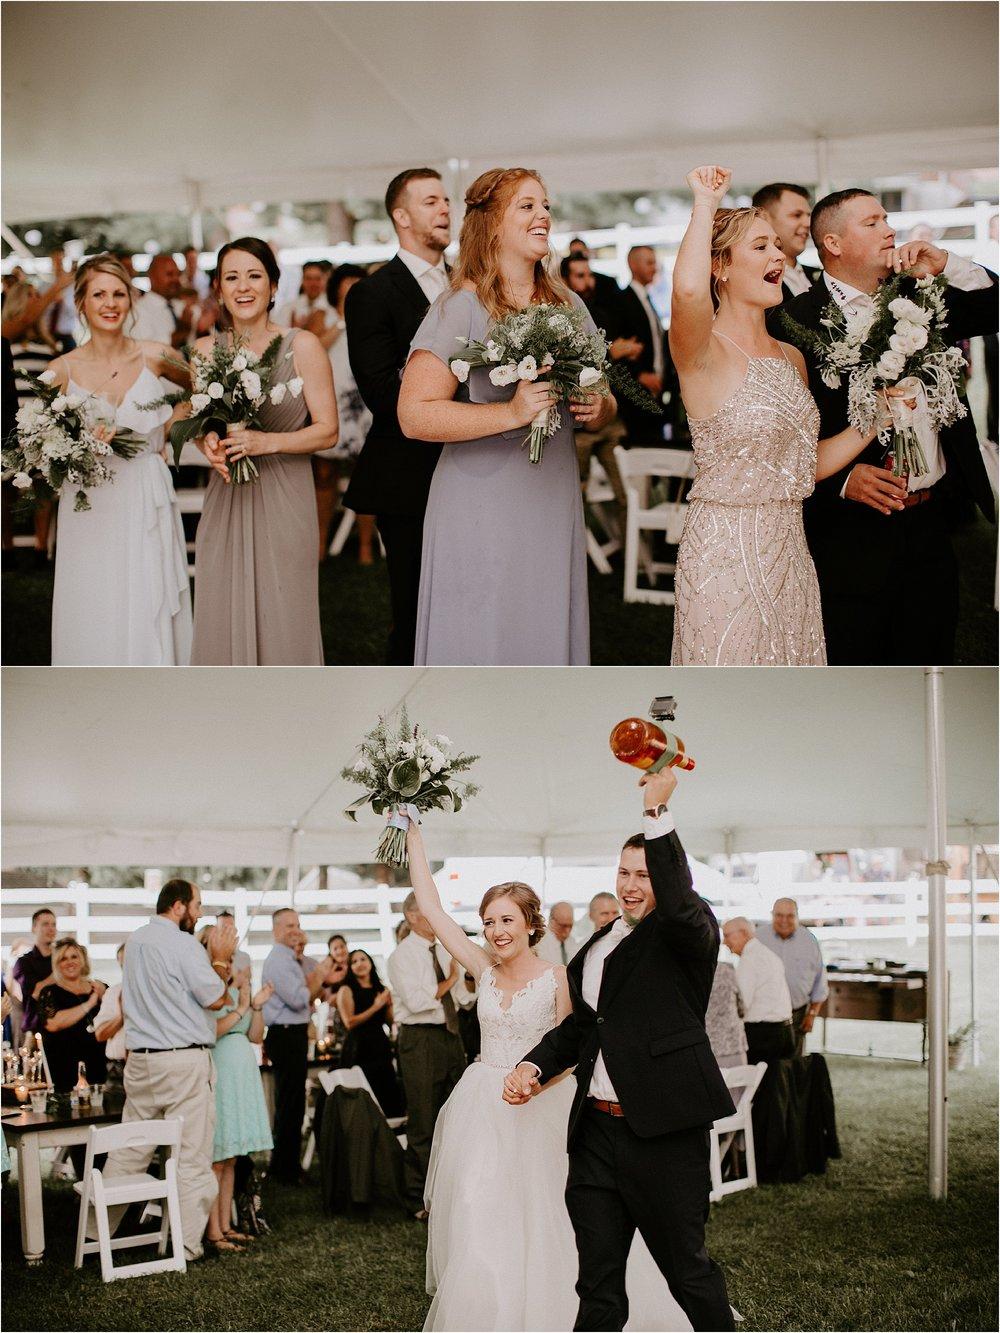 Sarah_Brookhart_Lancaster_Wedding_Photographer_0068.jpg